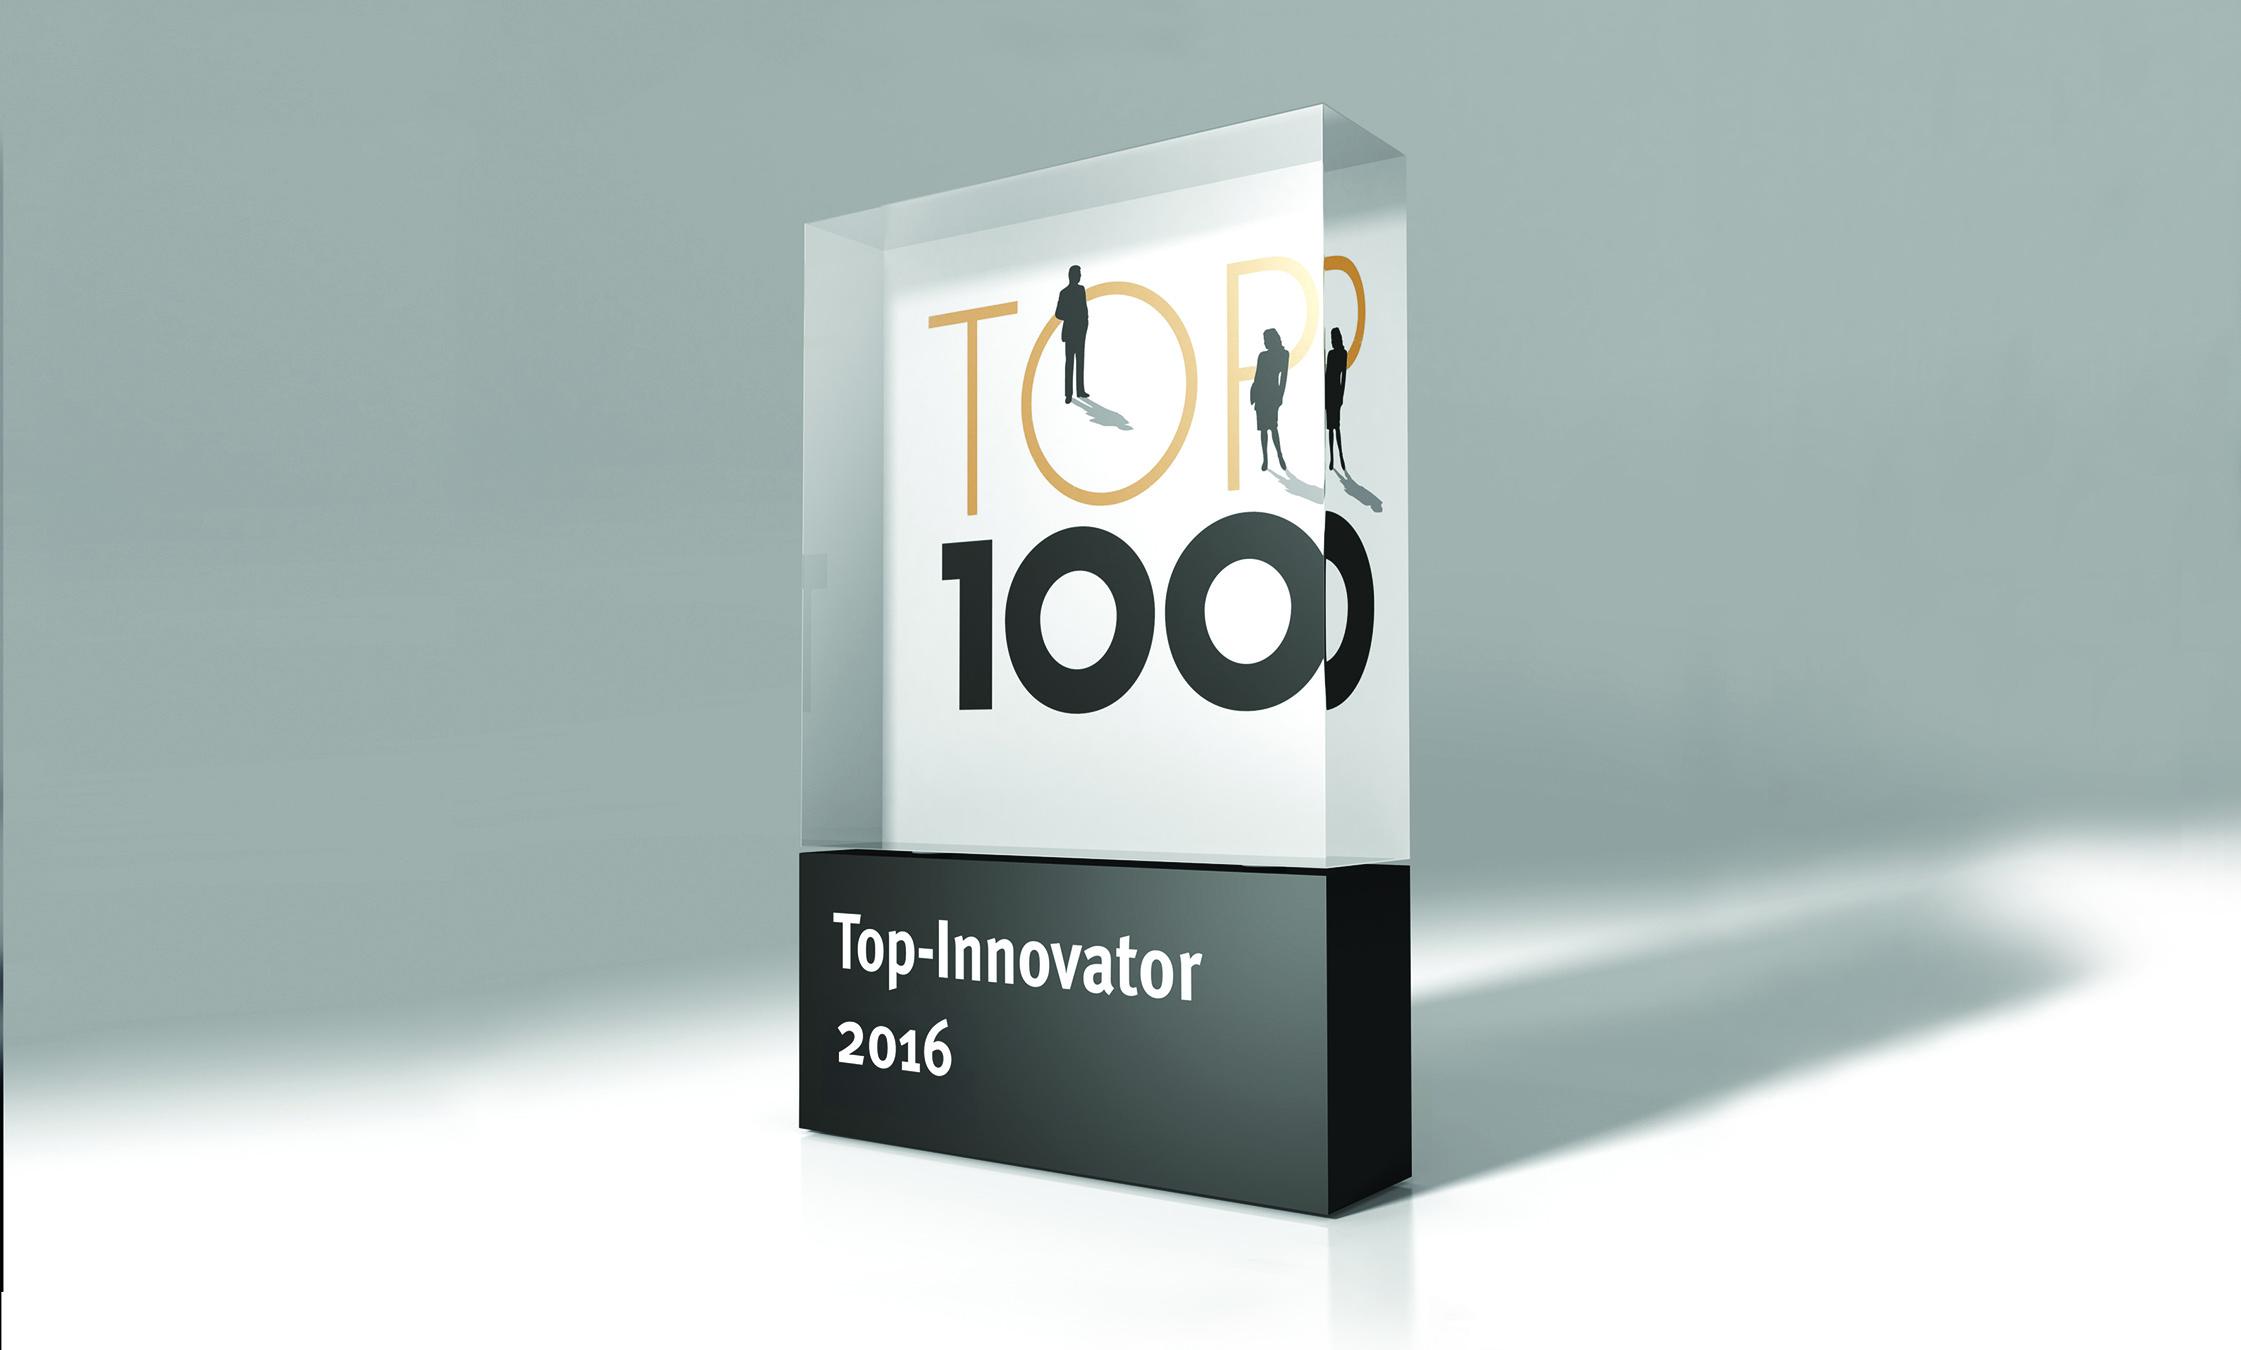 QUNDIS ist TOP100 Innovator des Jahres 2016